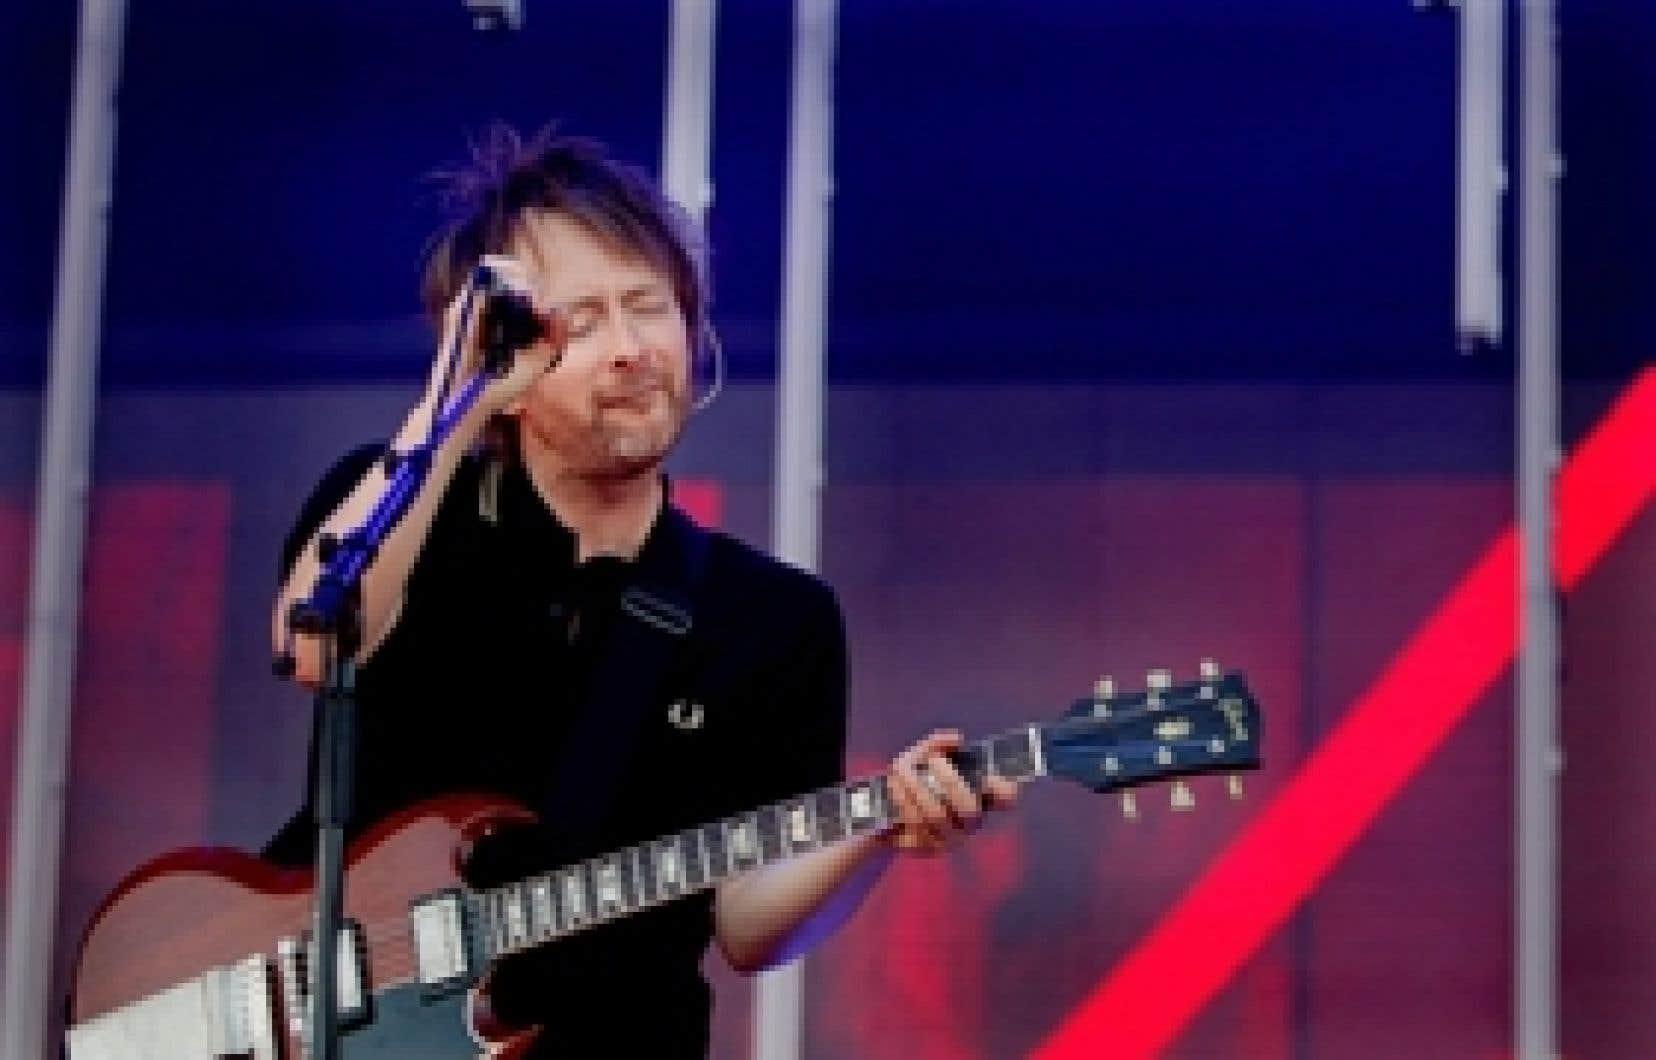 Thom Yorke, le chanteur de la formation britannique Radiohead. En octobre 2007, Radiohead a lancé son dernier album In Rainbows en téléchargement sur Internet.